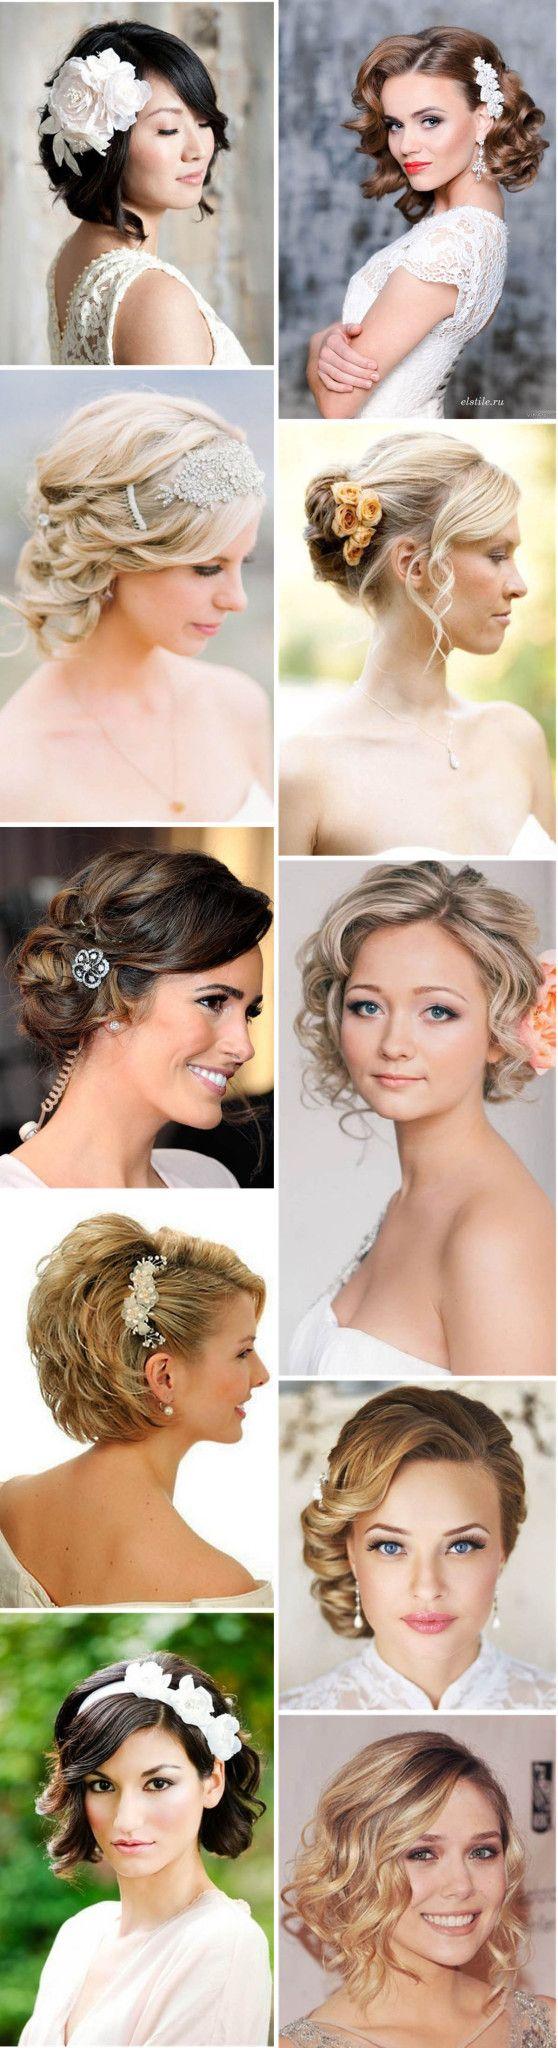 fantastic wedding hairstyles